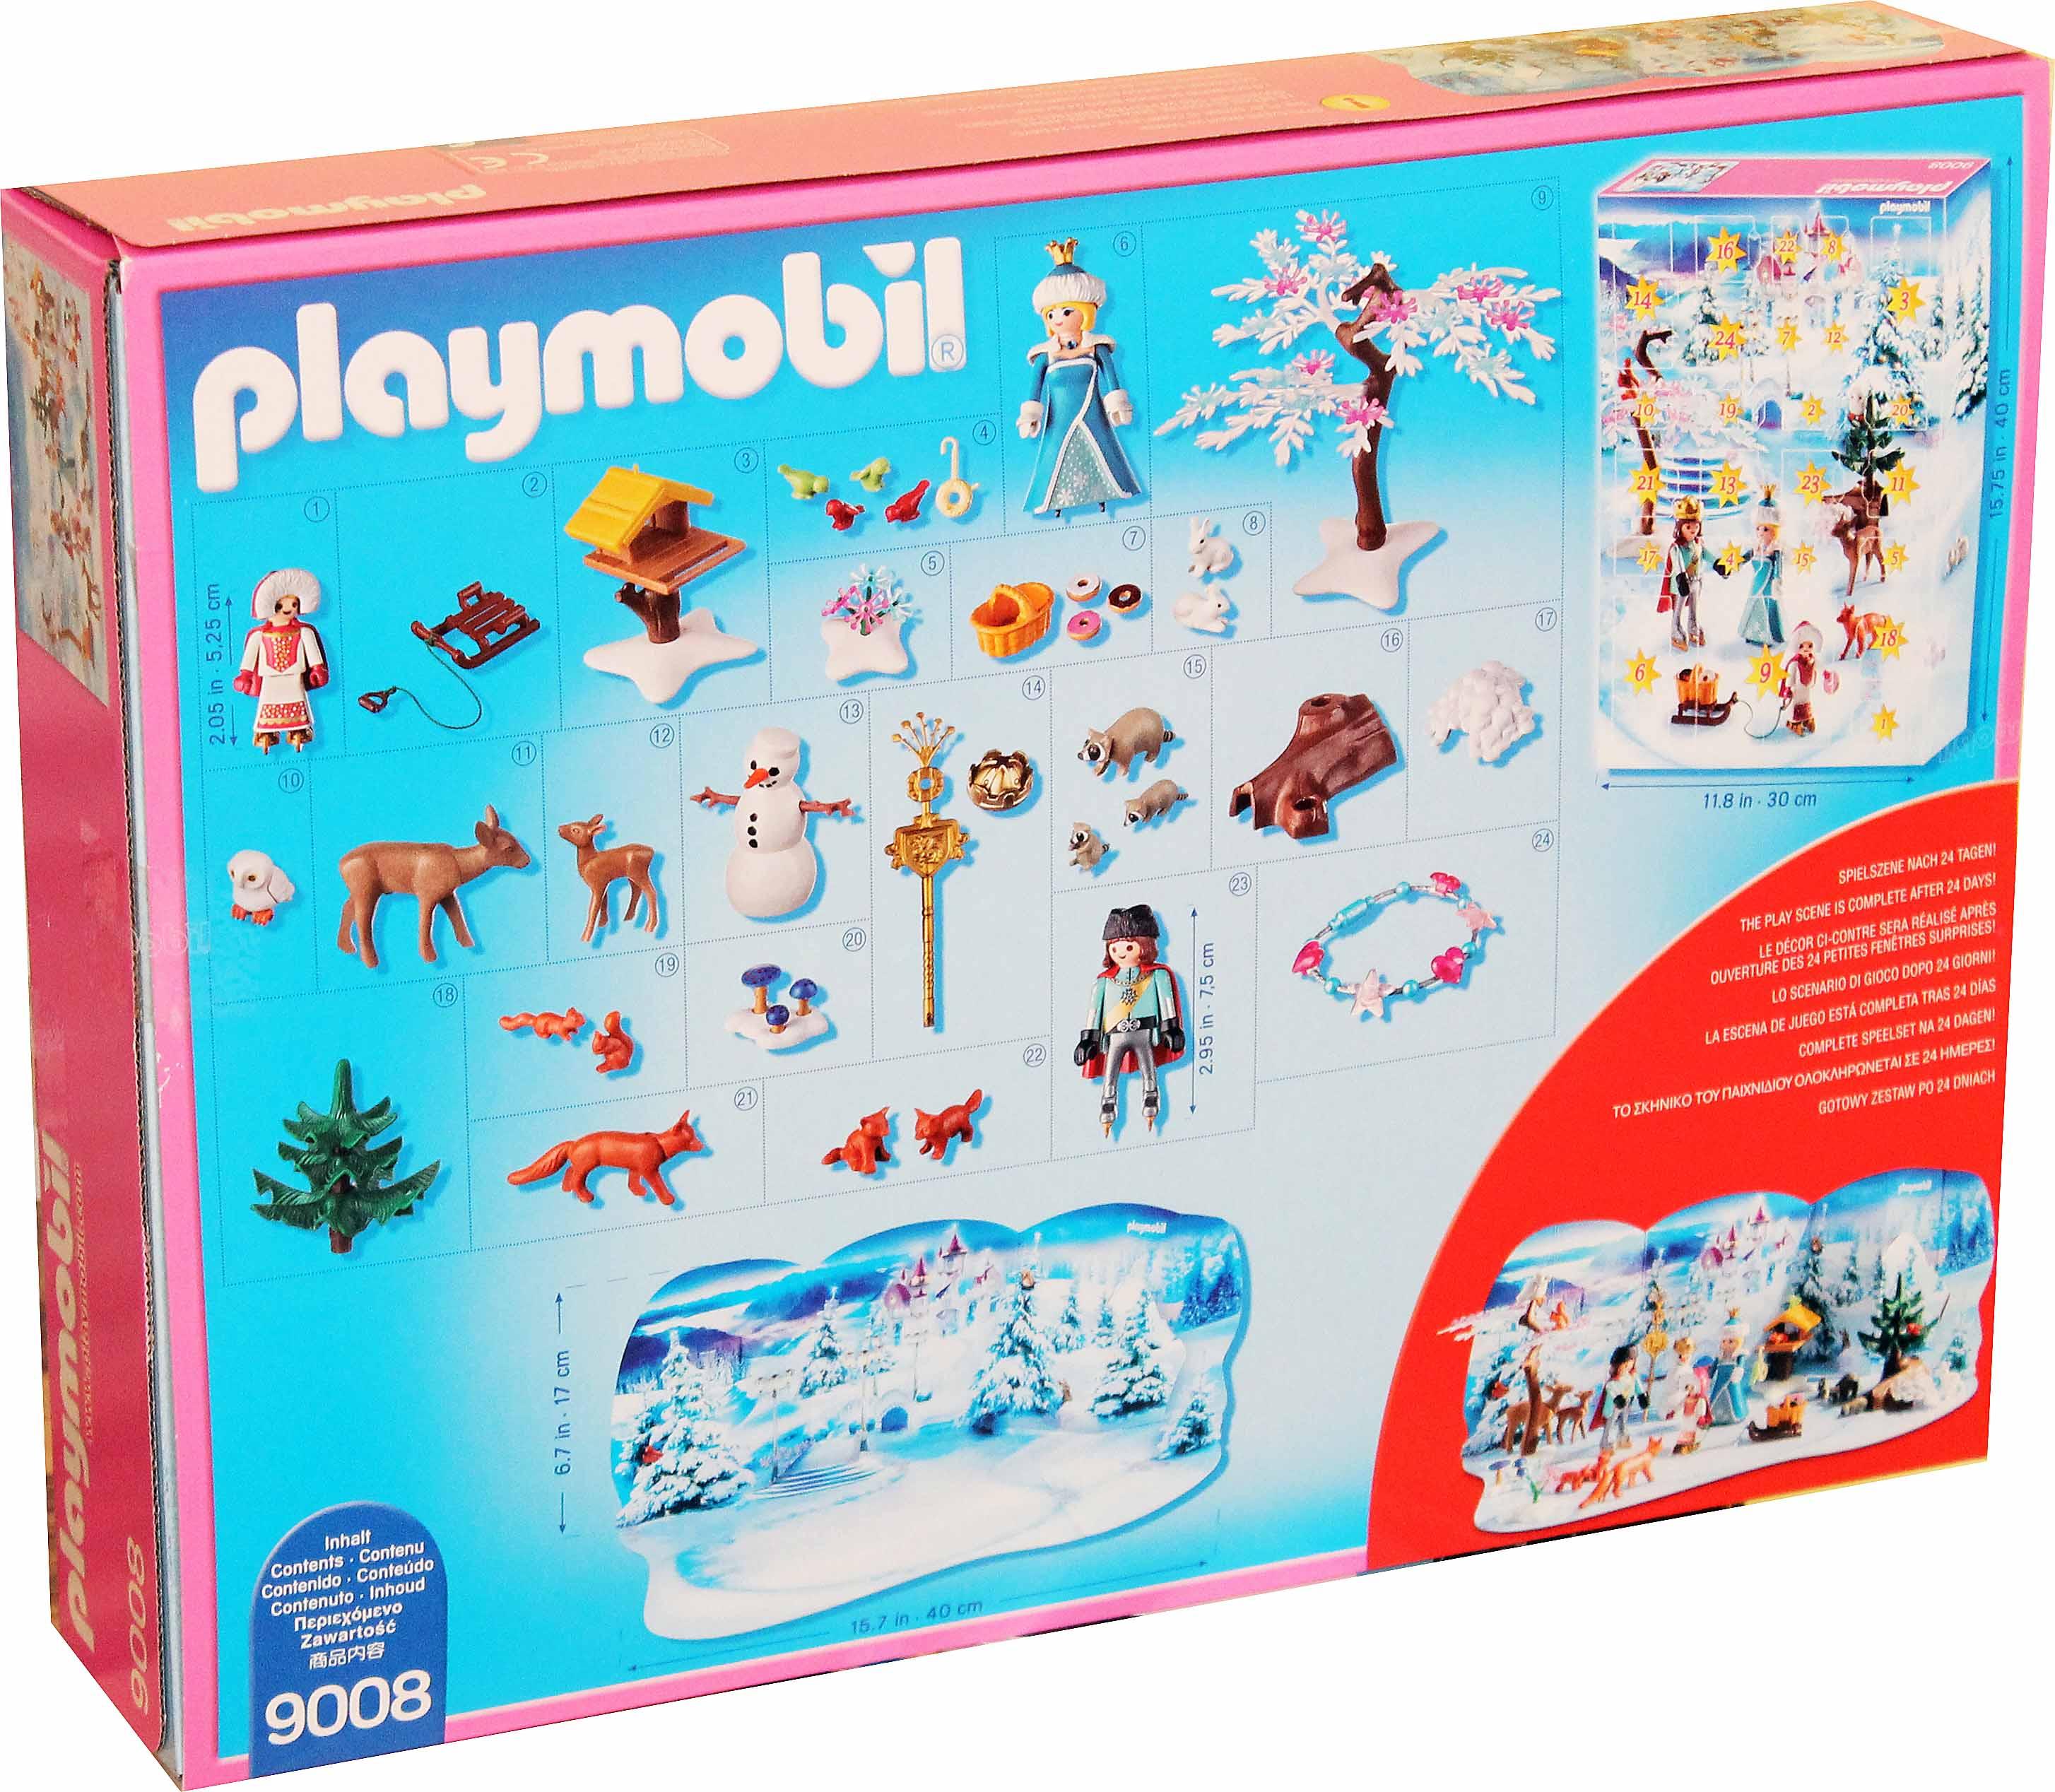 playmobil weihnachtskalender 2015 calendar template 2016. Black Bedroom Furniture Sets. Home Design Ideas